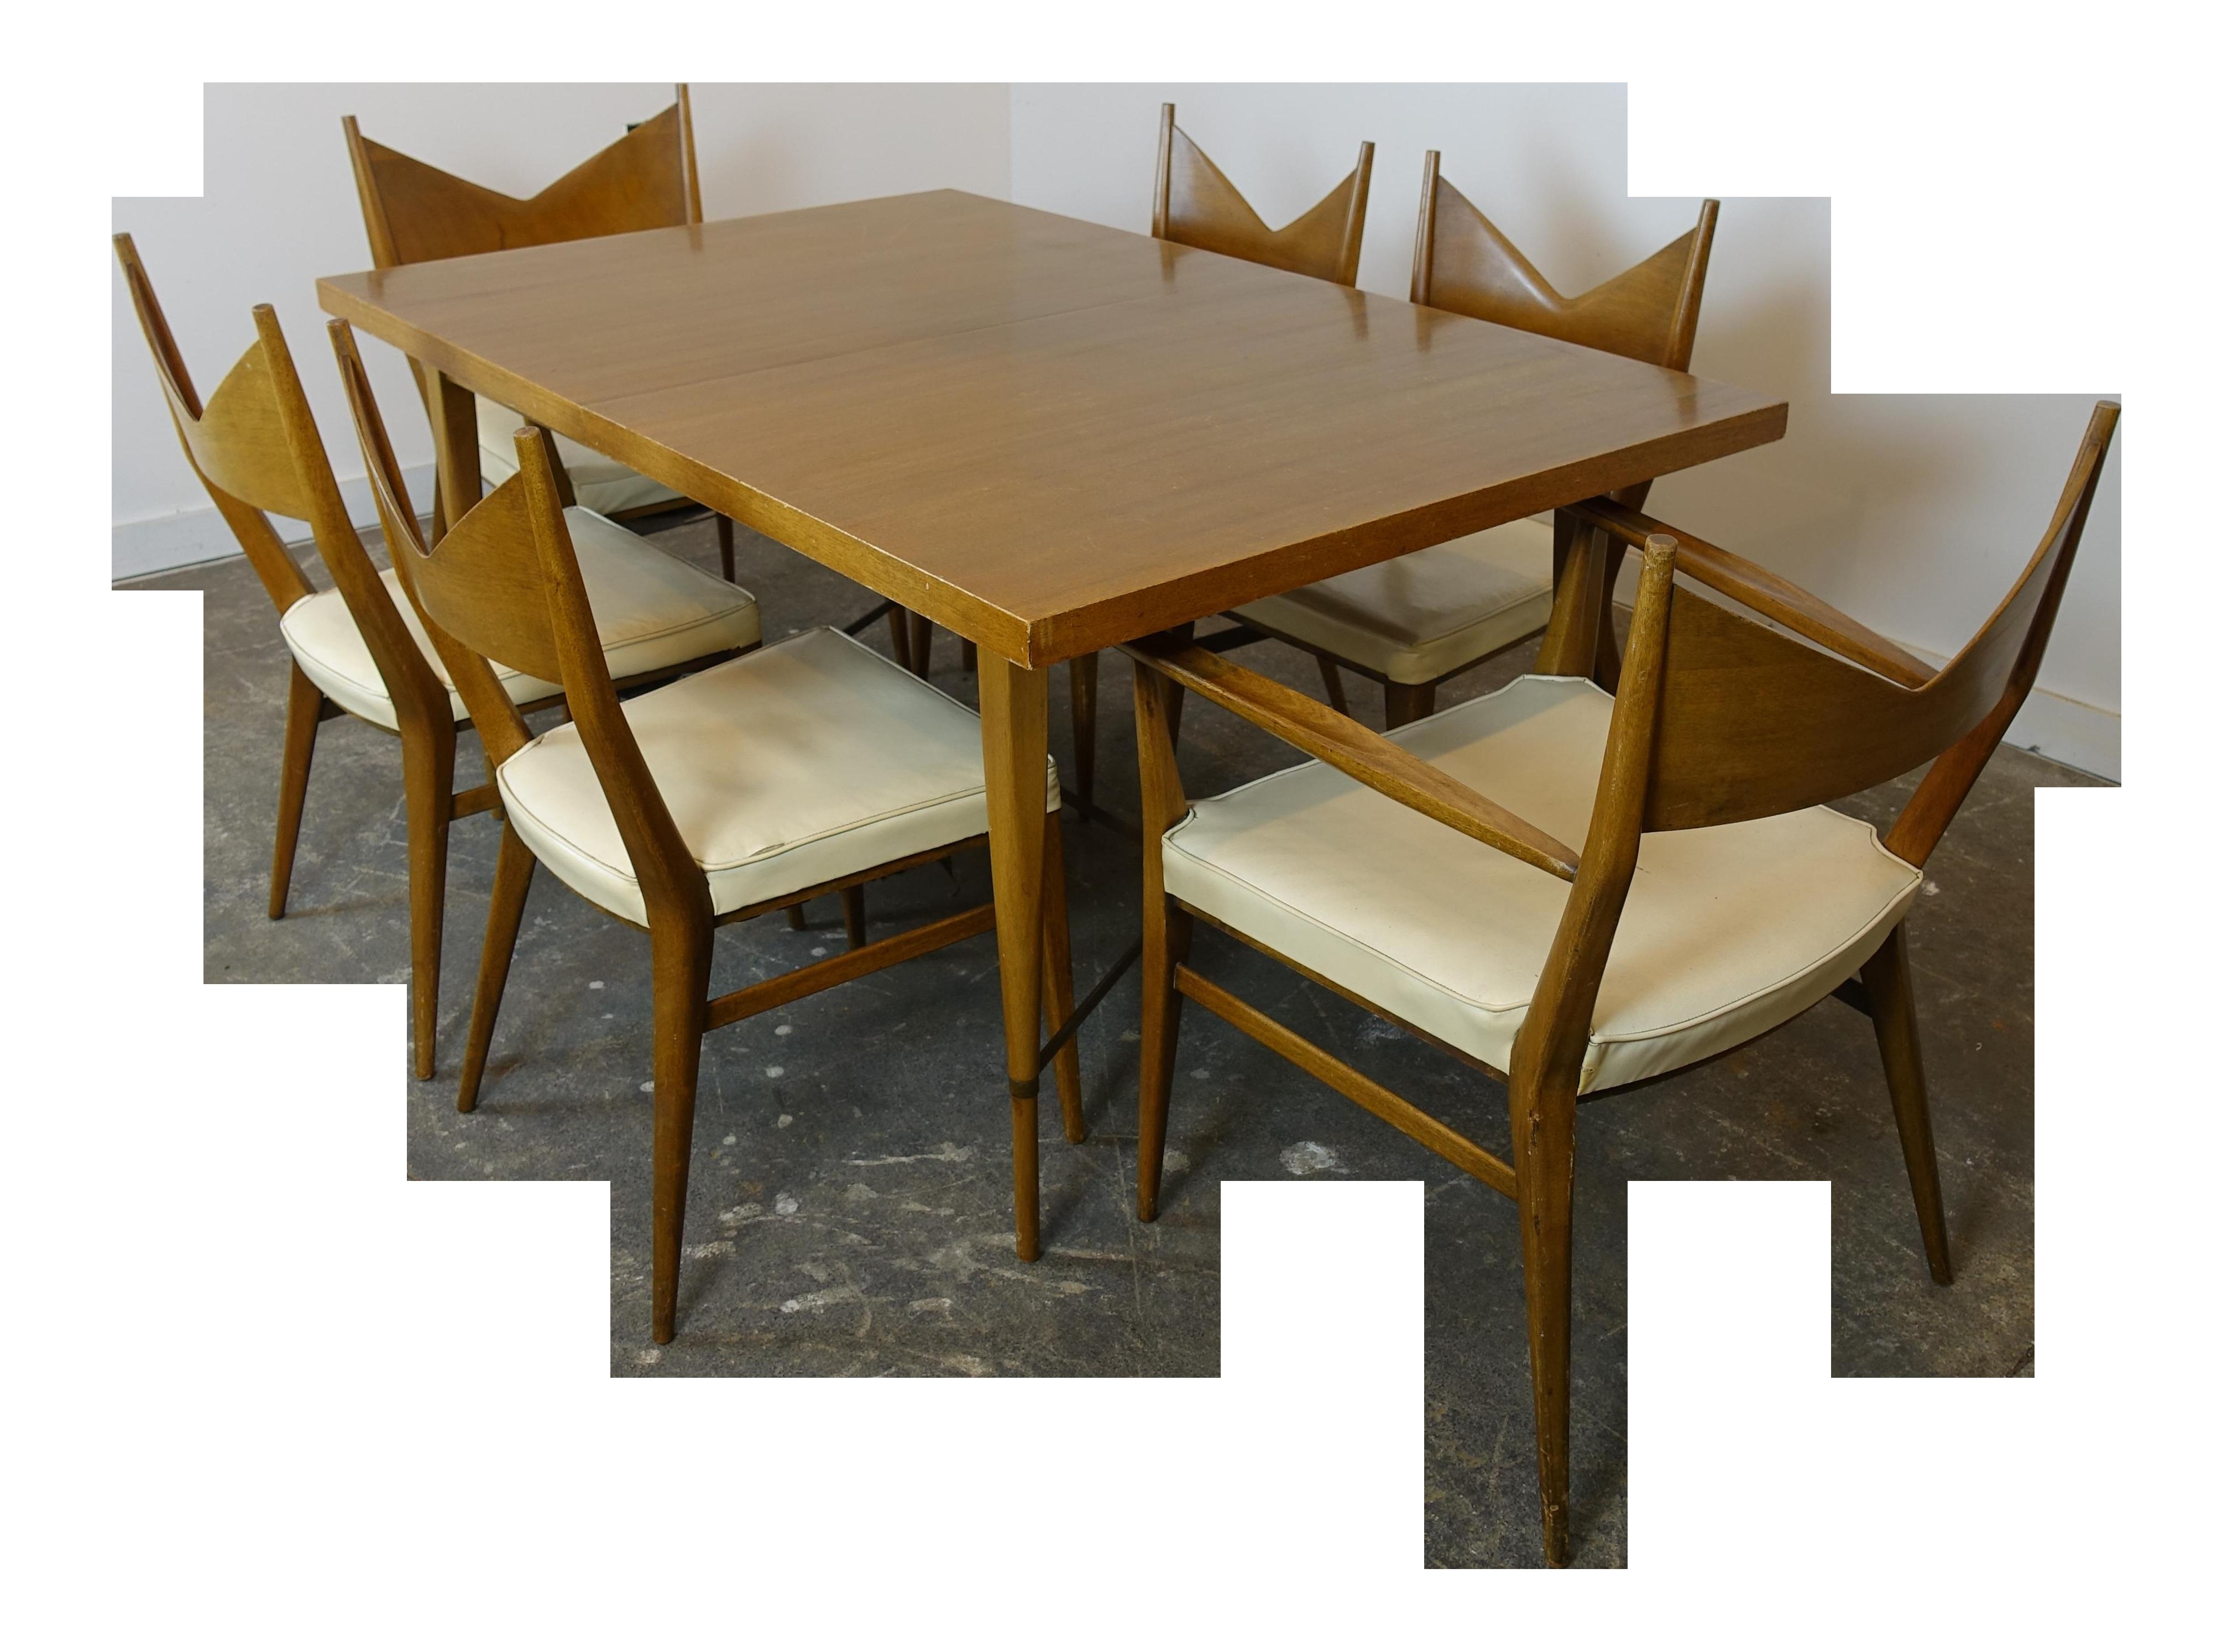 Office Cabin Interior Design, 1950s Mid Century Modern Paul Mccobb Dining Set 7 Pieces Chairish